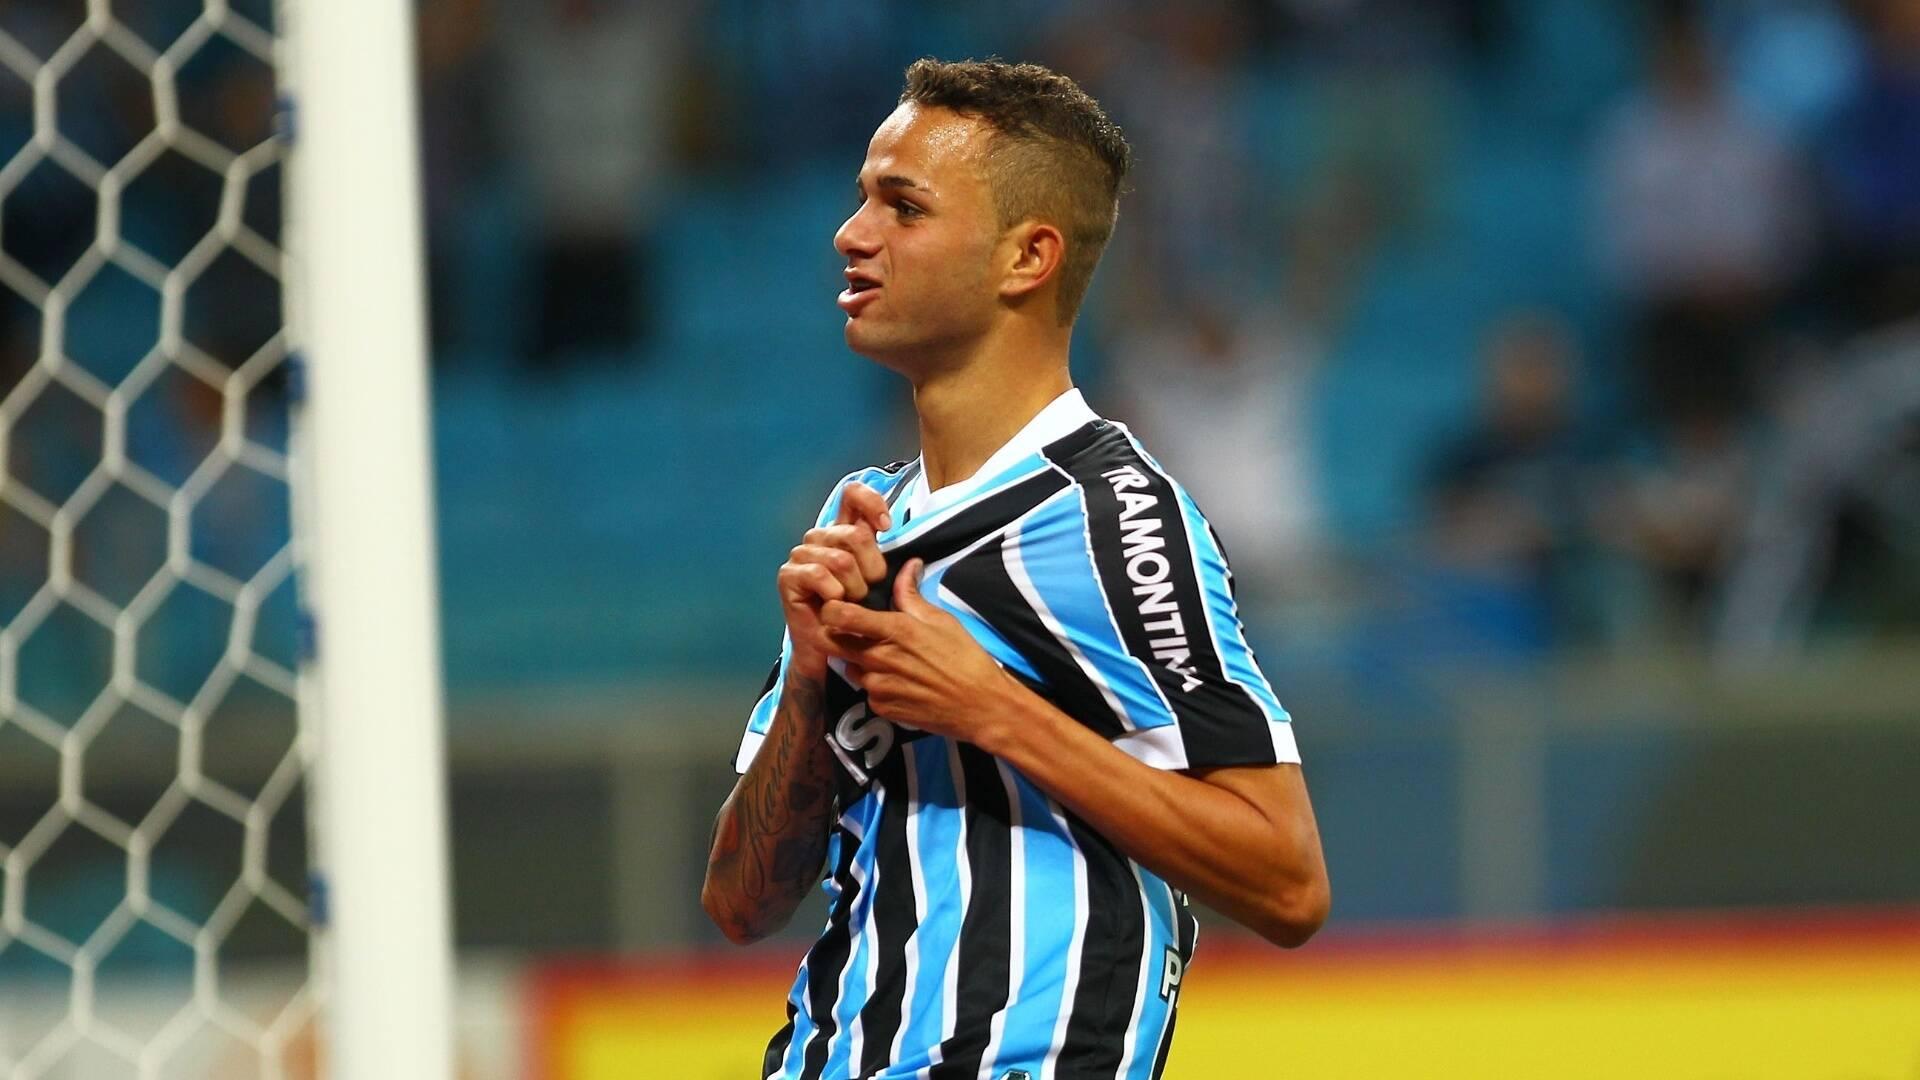 Foto: Flickr oficial do Grêmio